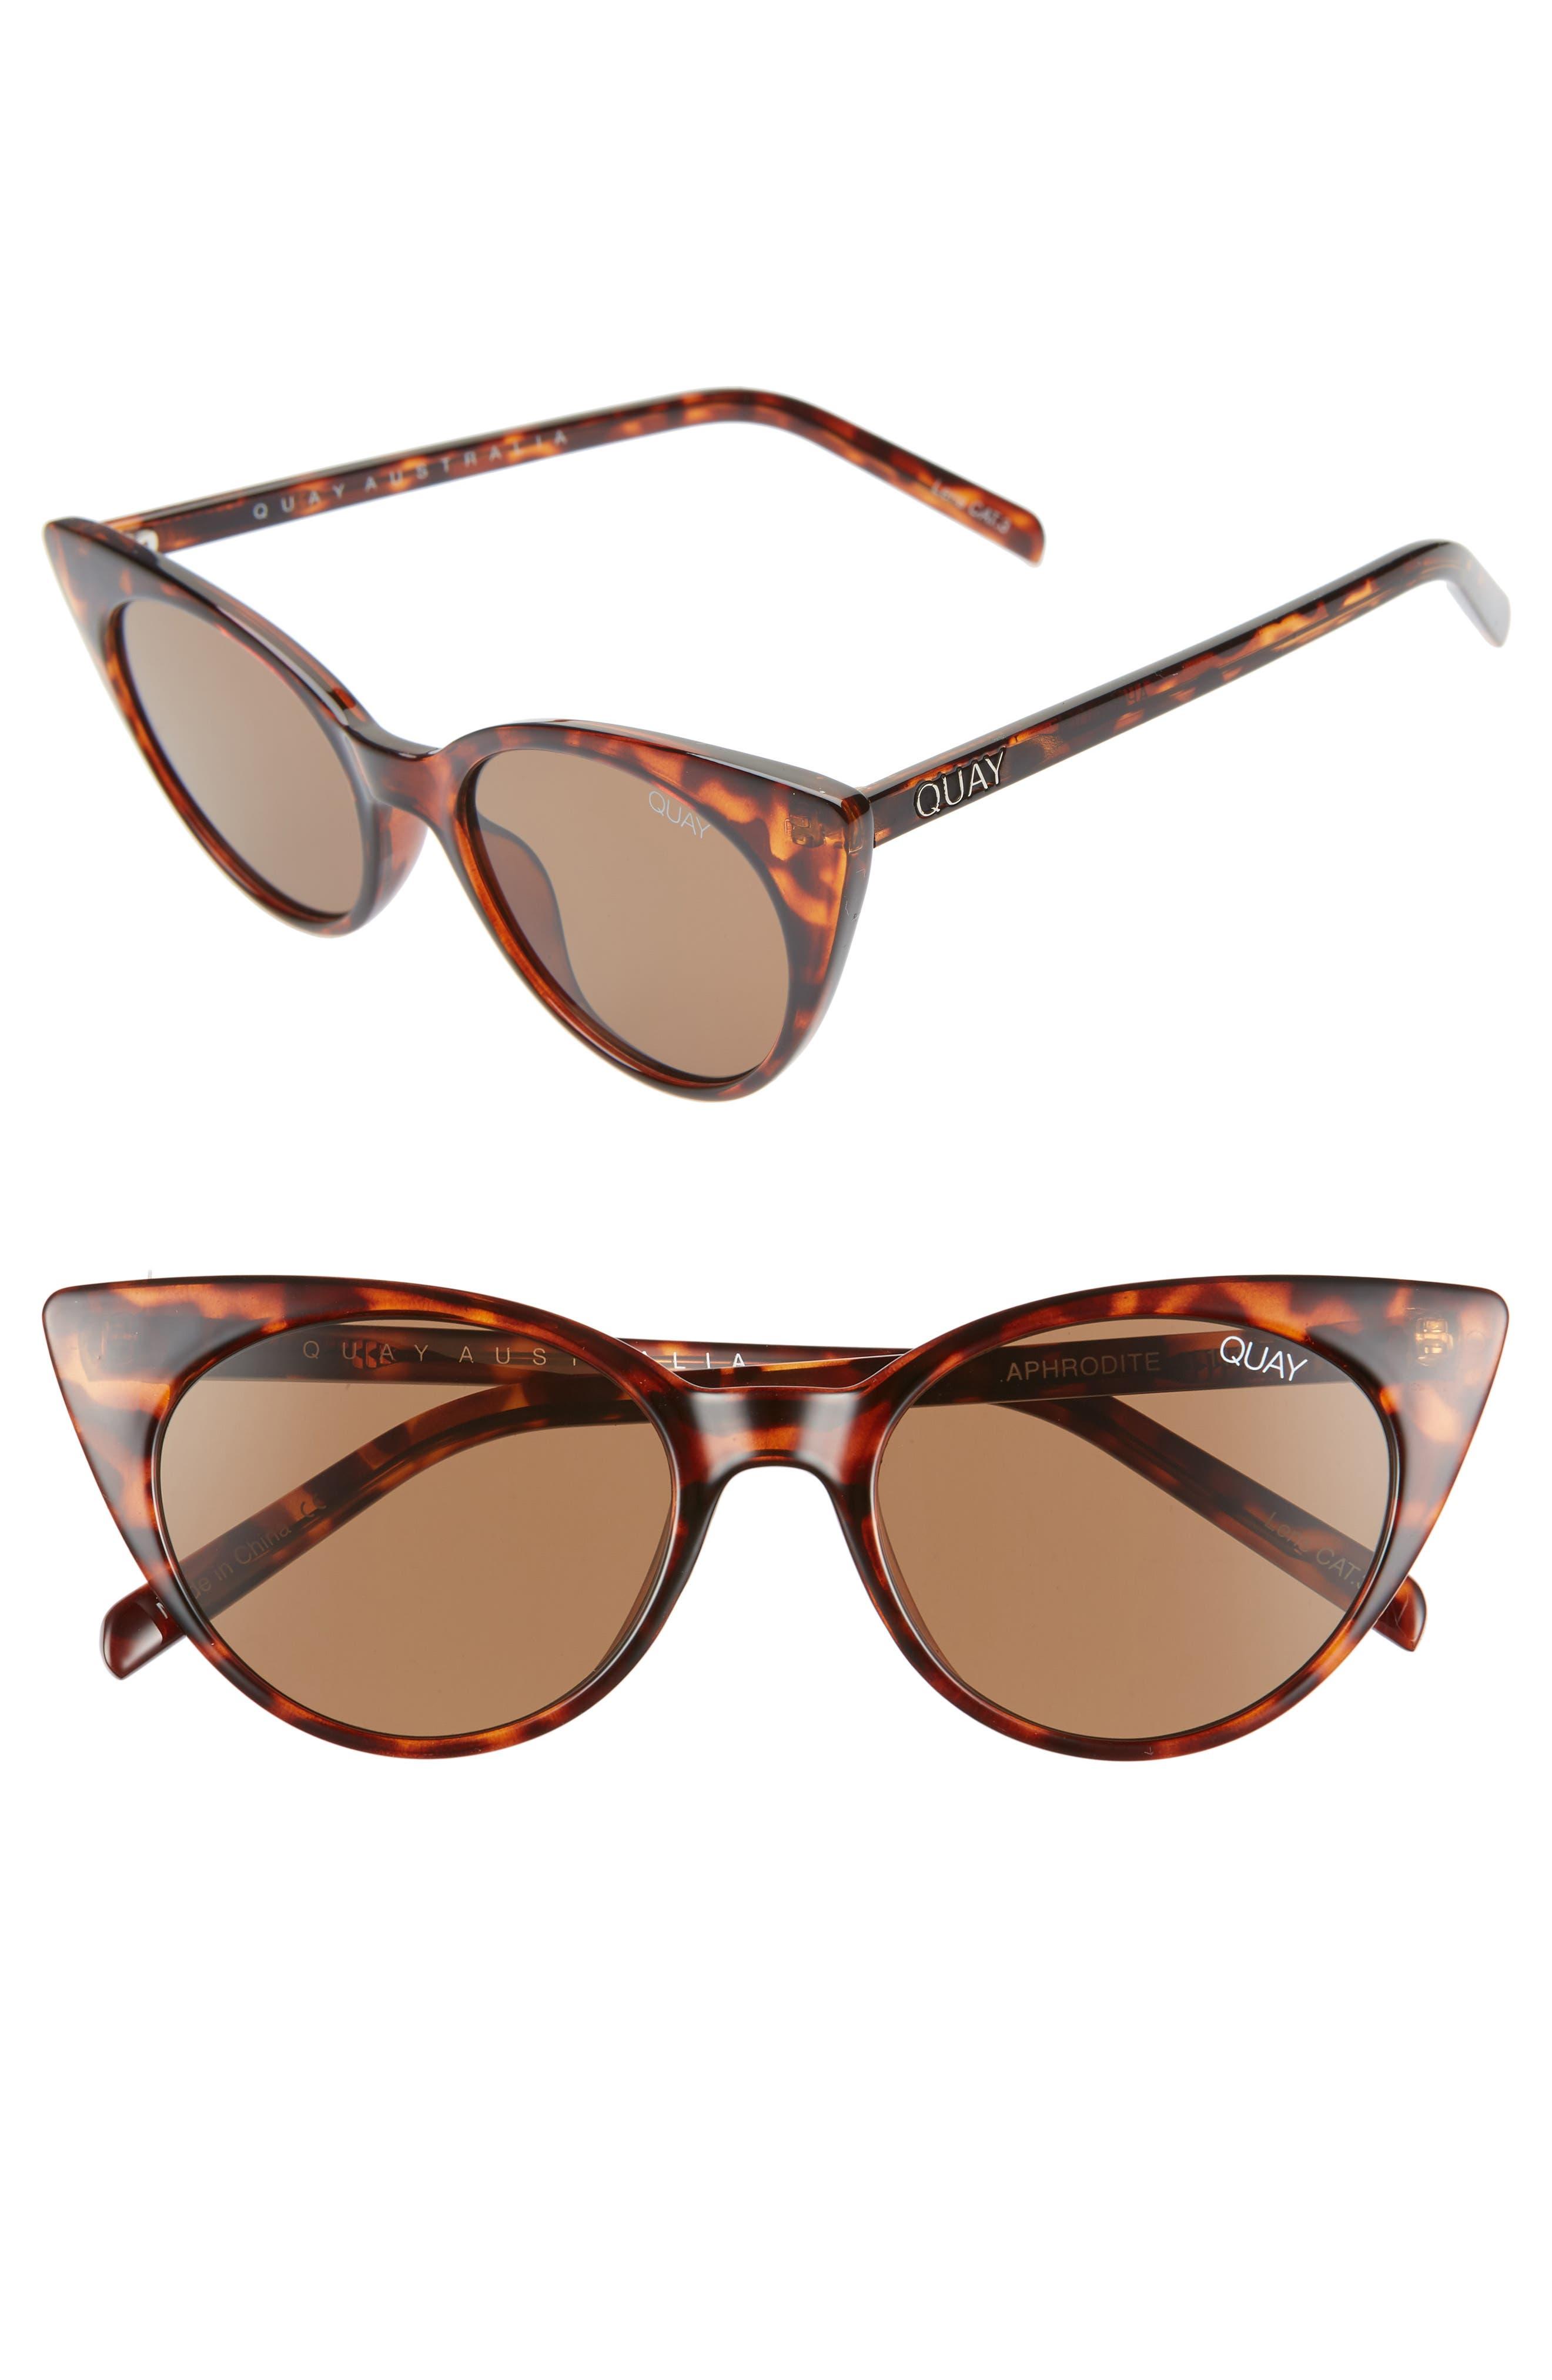 Quay Australia Aphrodite 5m Cat Eye Sunglasses - Tortoise/ Brown